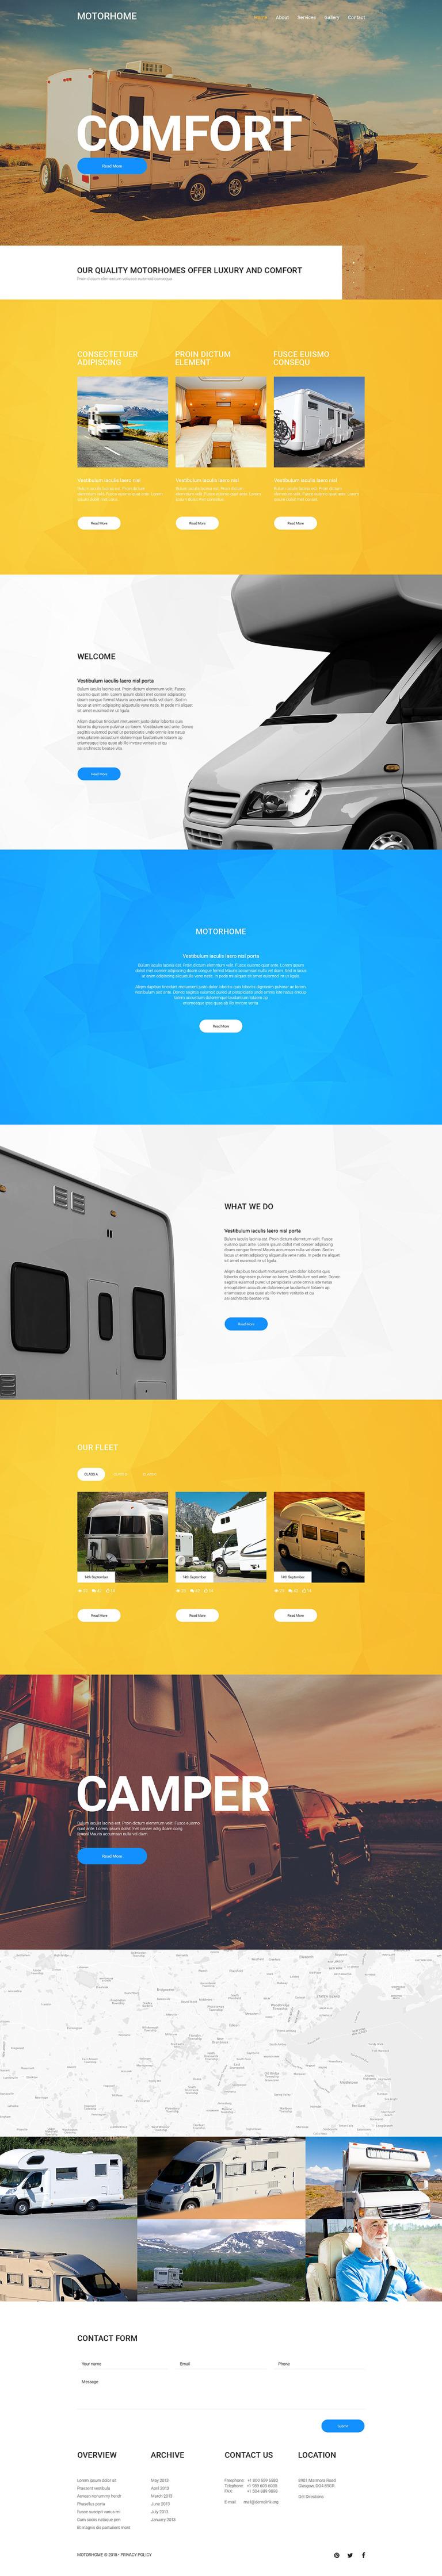 Motorhome Website Template New Screenshots BIG